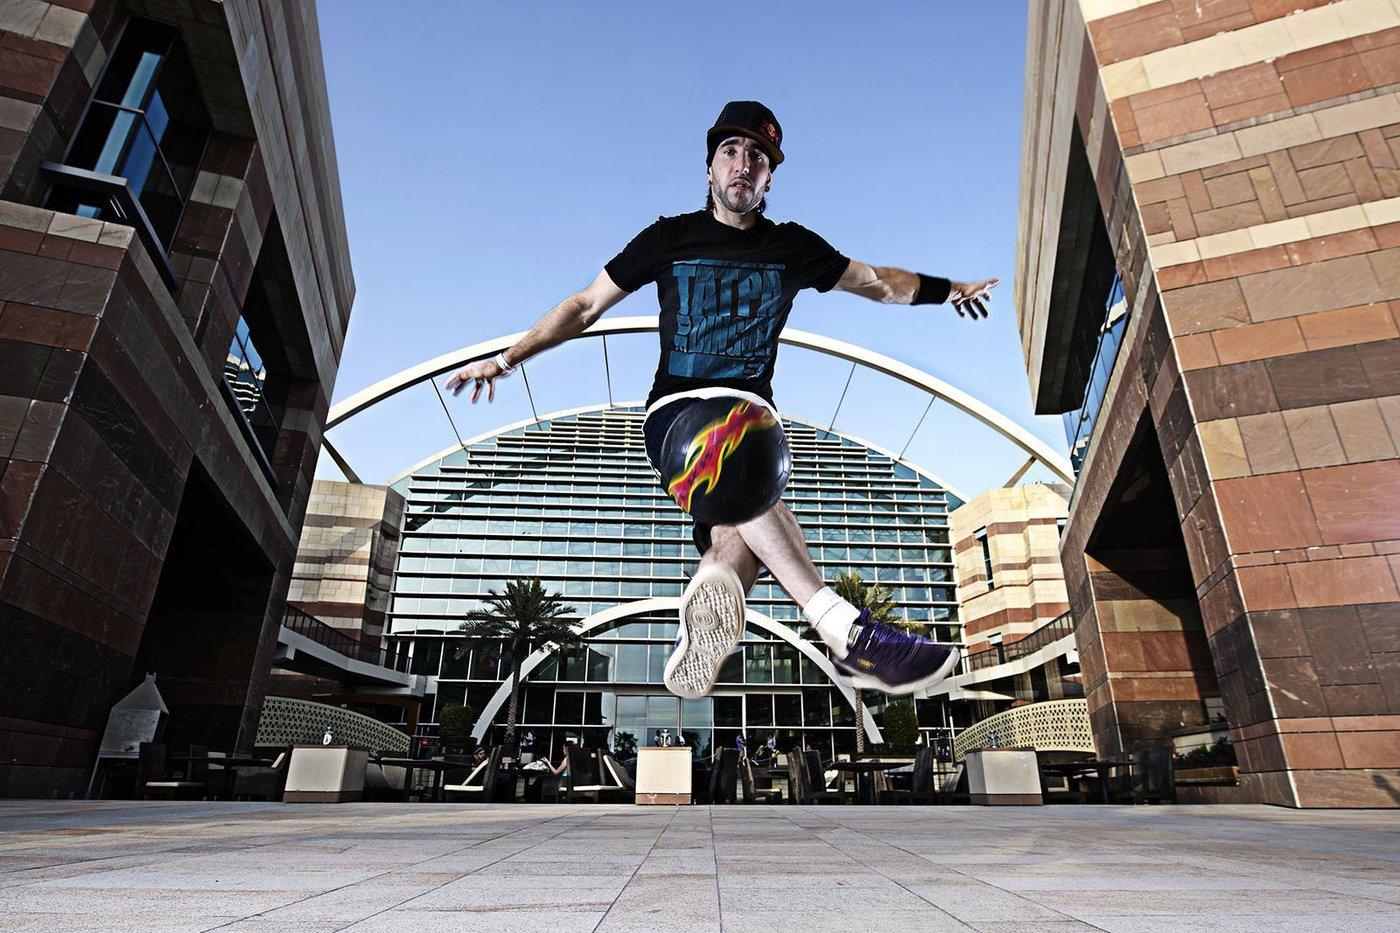 Sean Garnier performs during Red Bull Street Style in Dubai Festival City, Dubai, United Arab Emirates on June 29th, 2012 // Naim Chidiac/Red Bull Content Pool